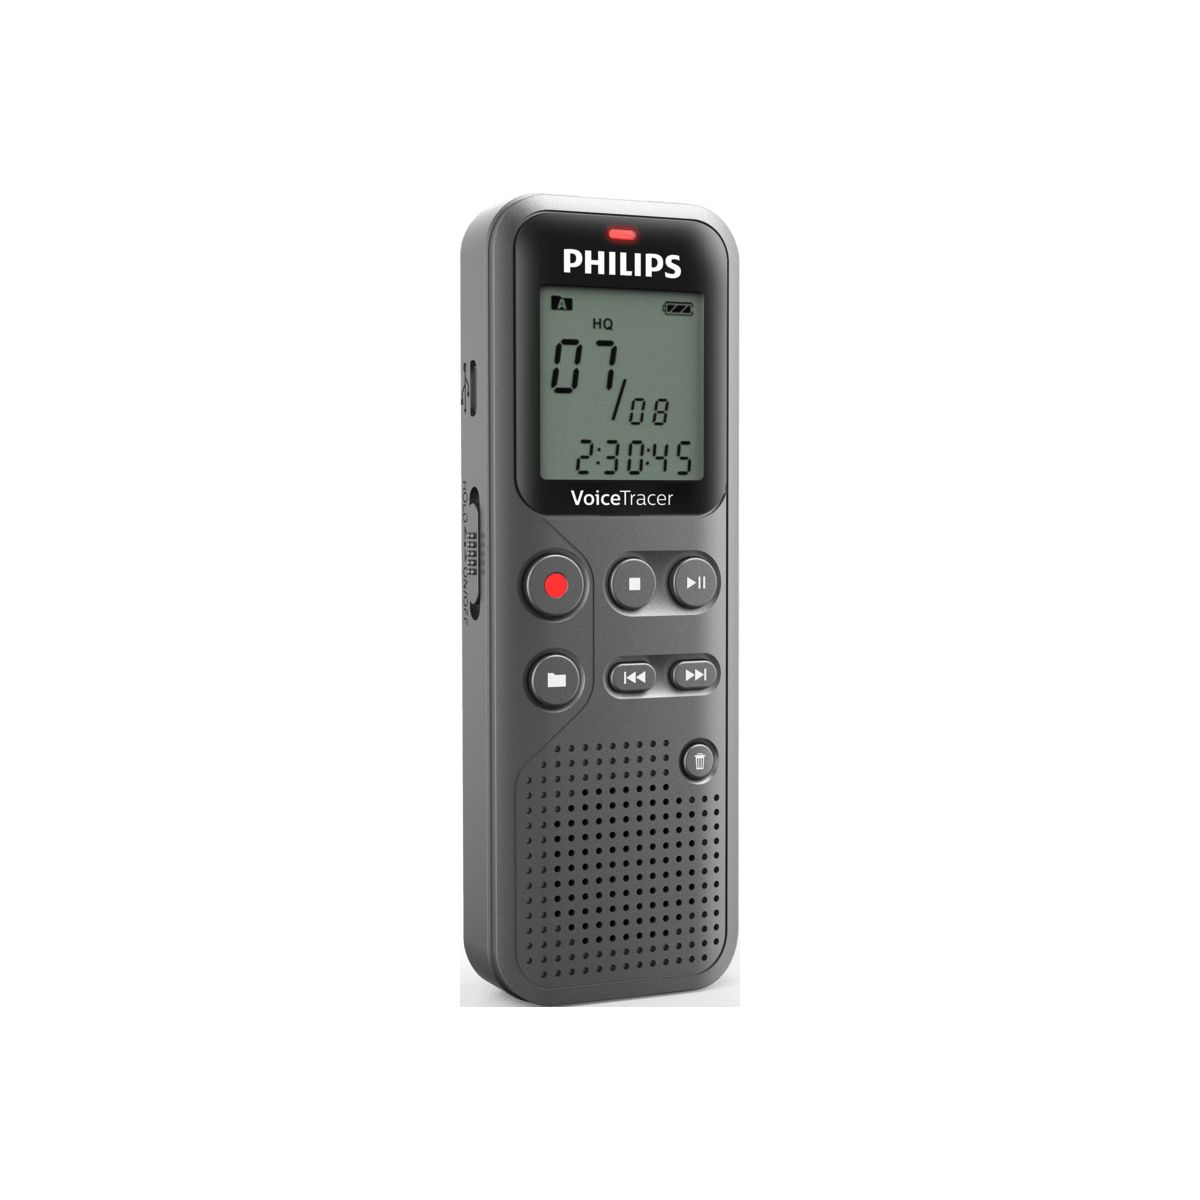 Dictaphone PHILIPS DVT1110 (photo)